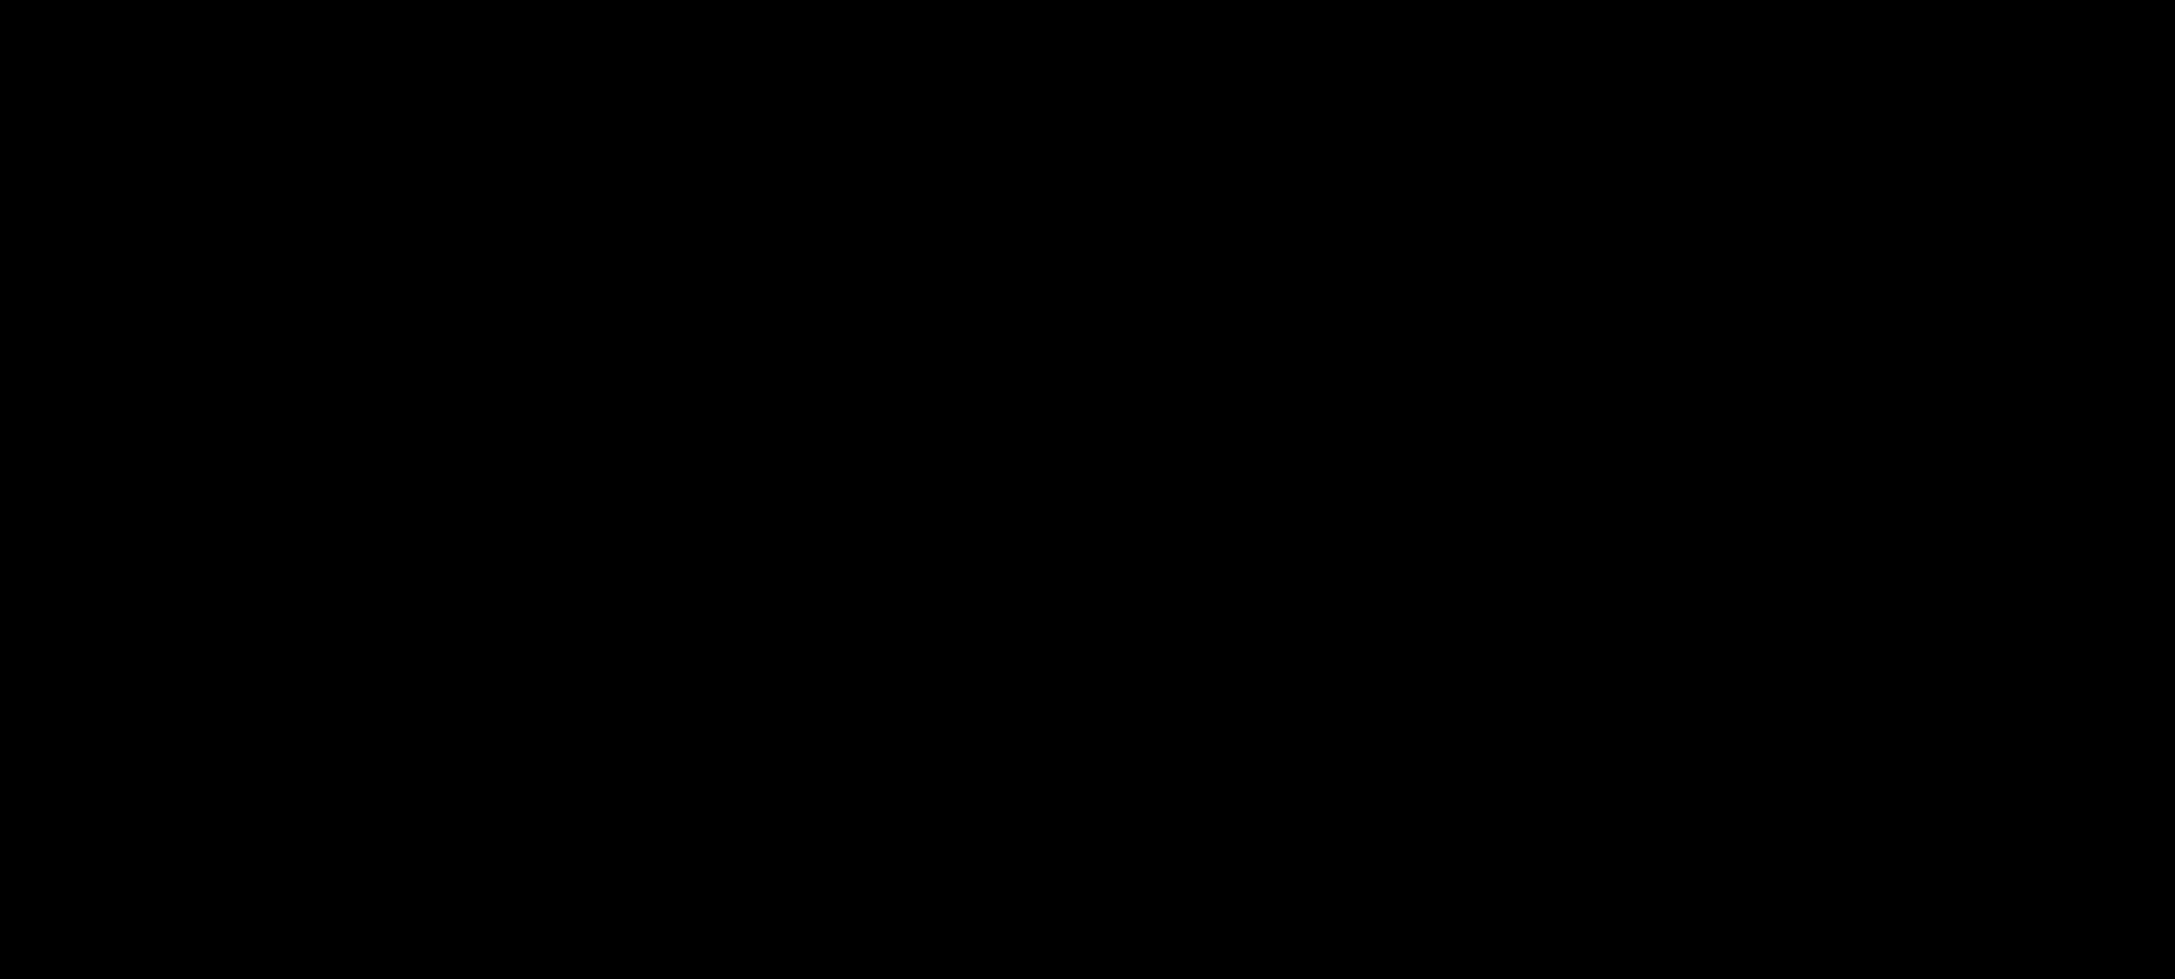 ADVrider Logo - VECTOR (1).png